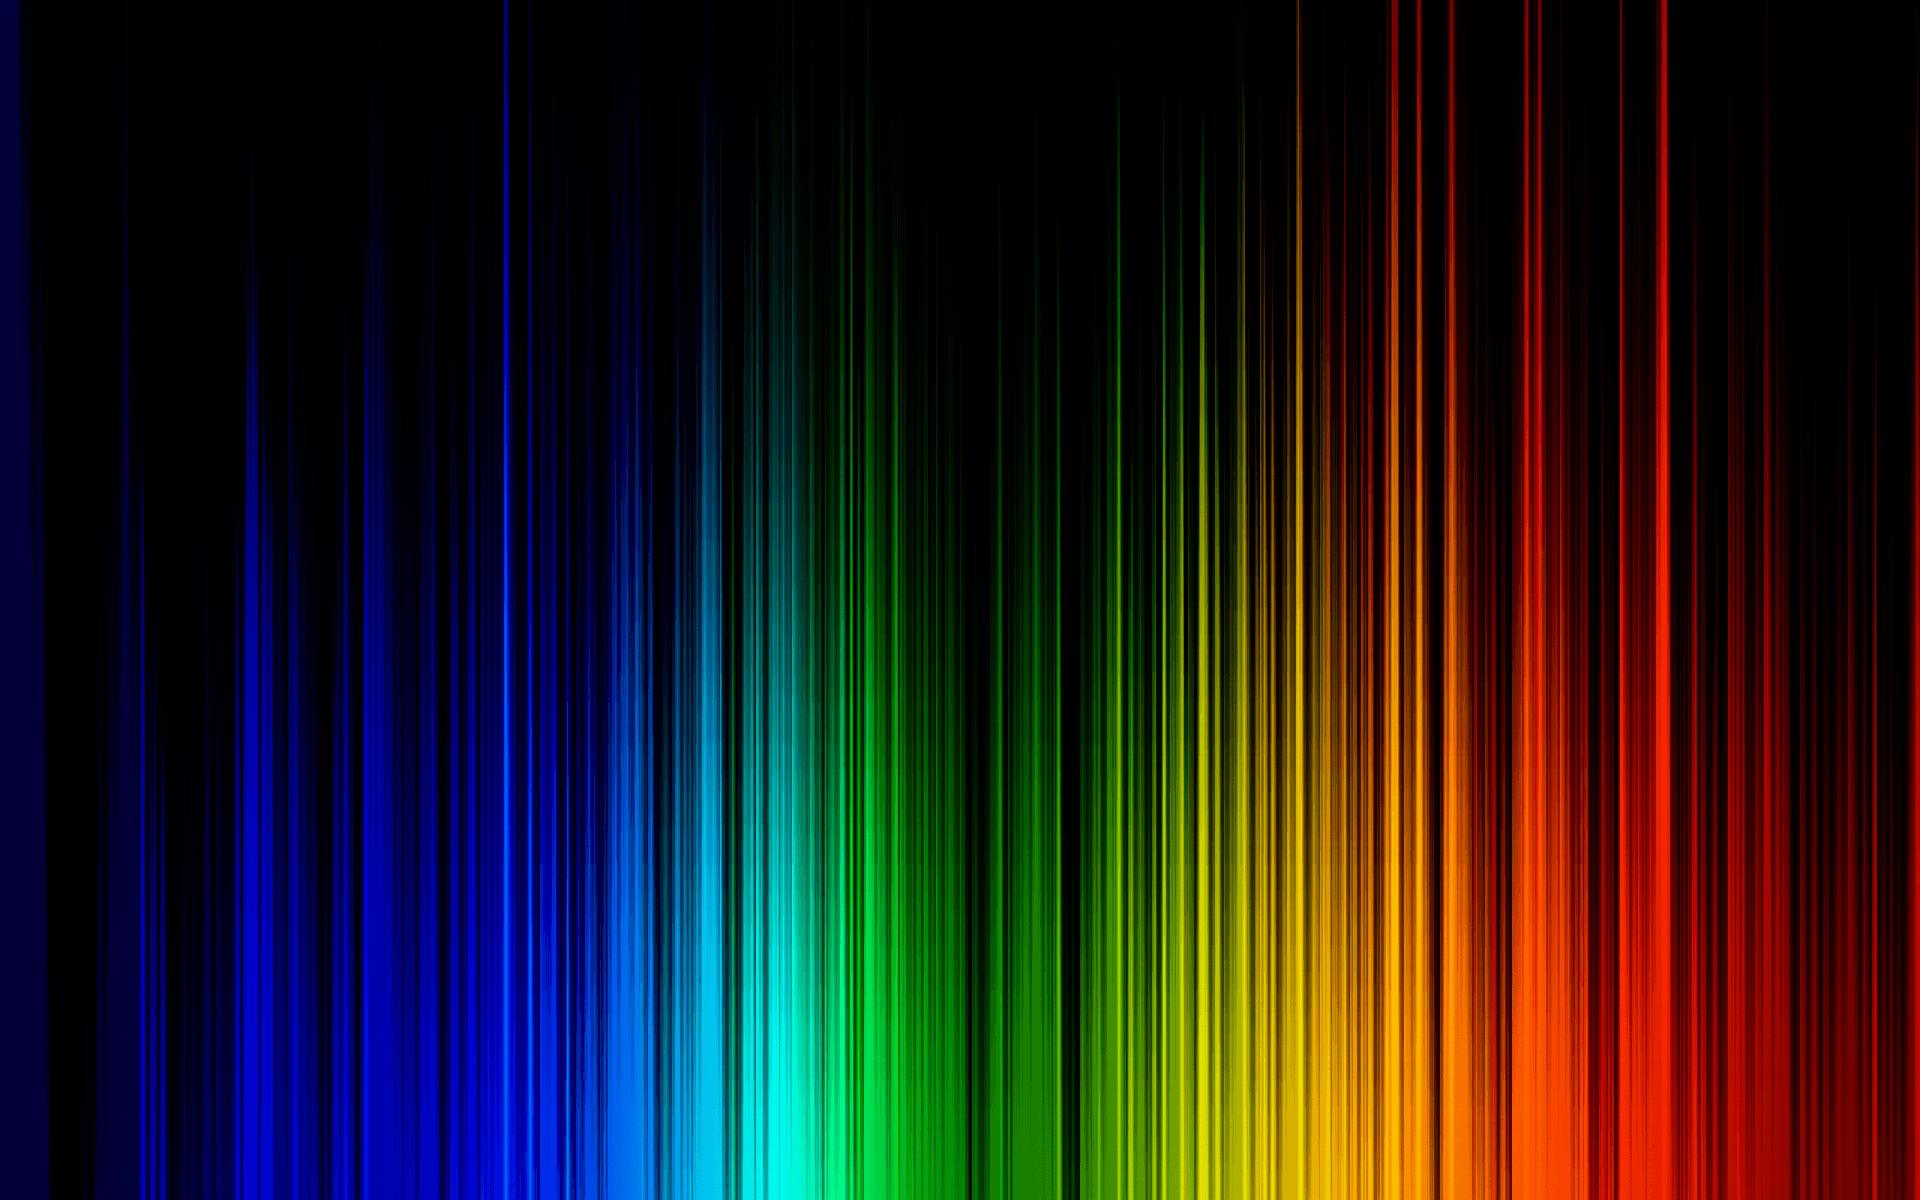 HD Neon Backgrounds 1920x1200